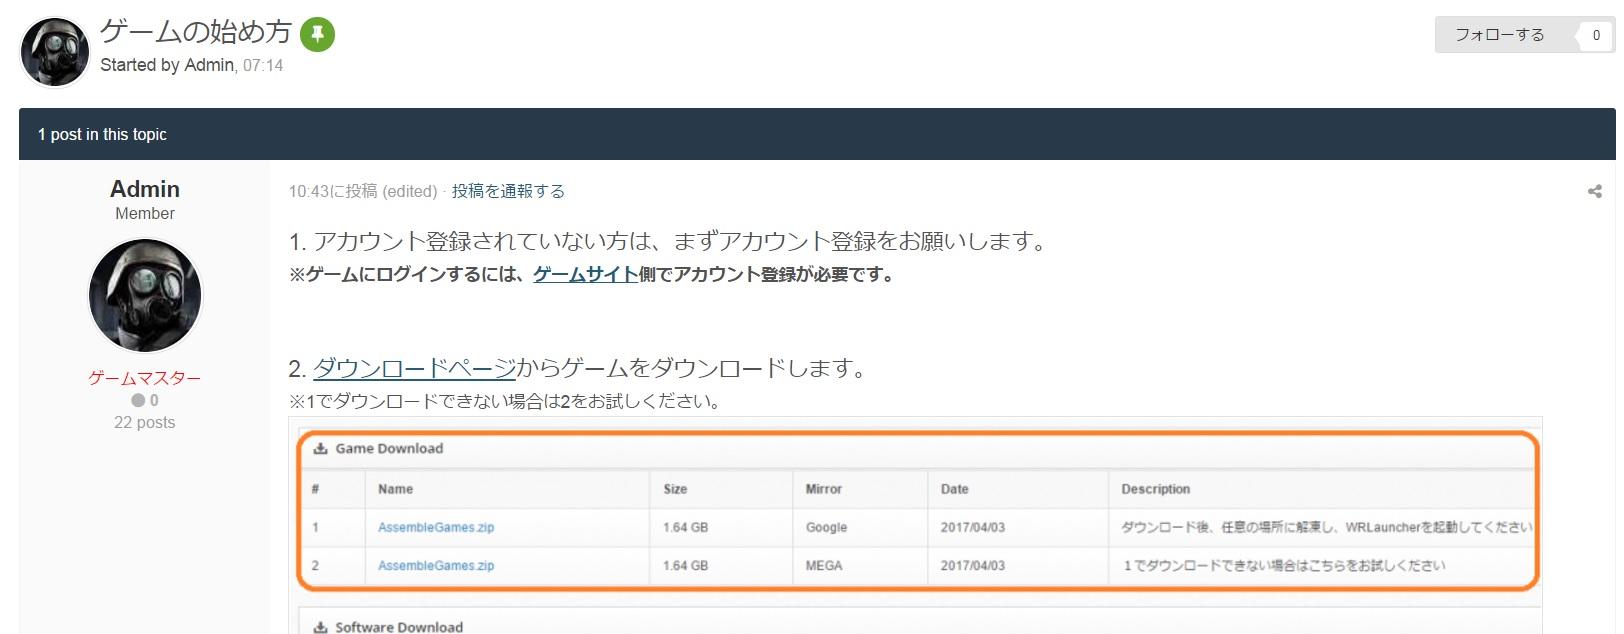 【日本版 裏WarRock】簡単!お手軽!! 3分間 AssembleWar  登録・起動方法